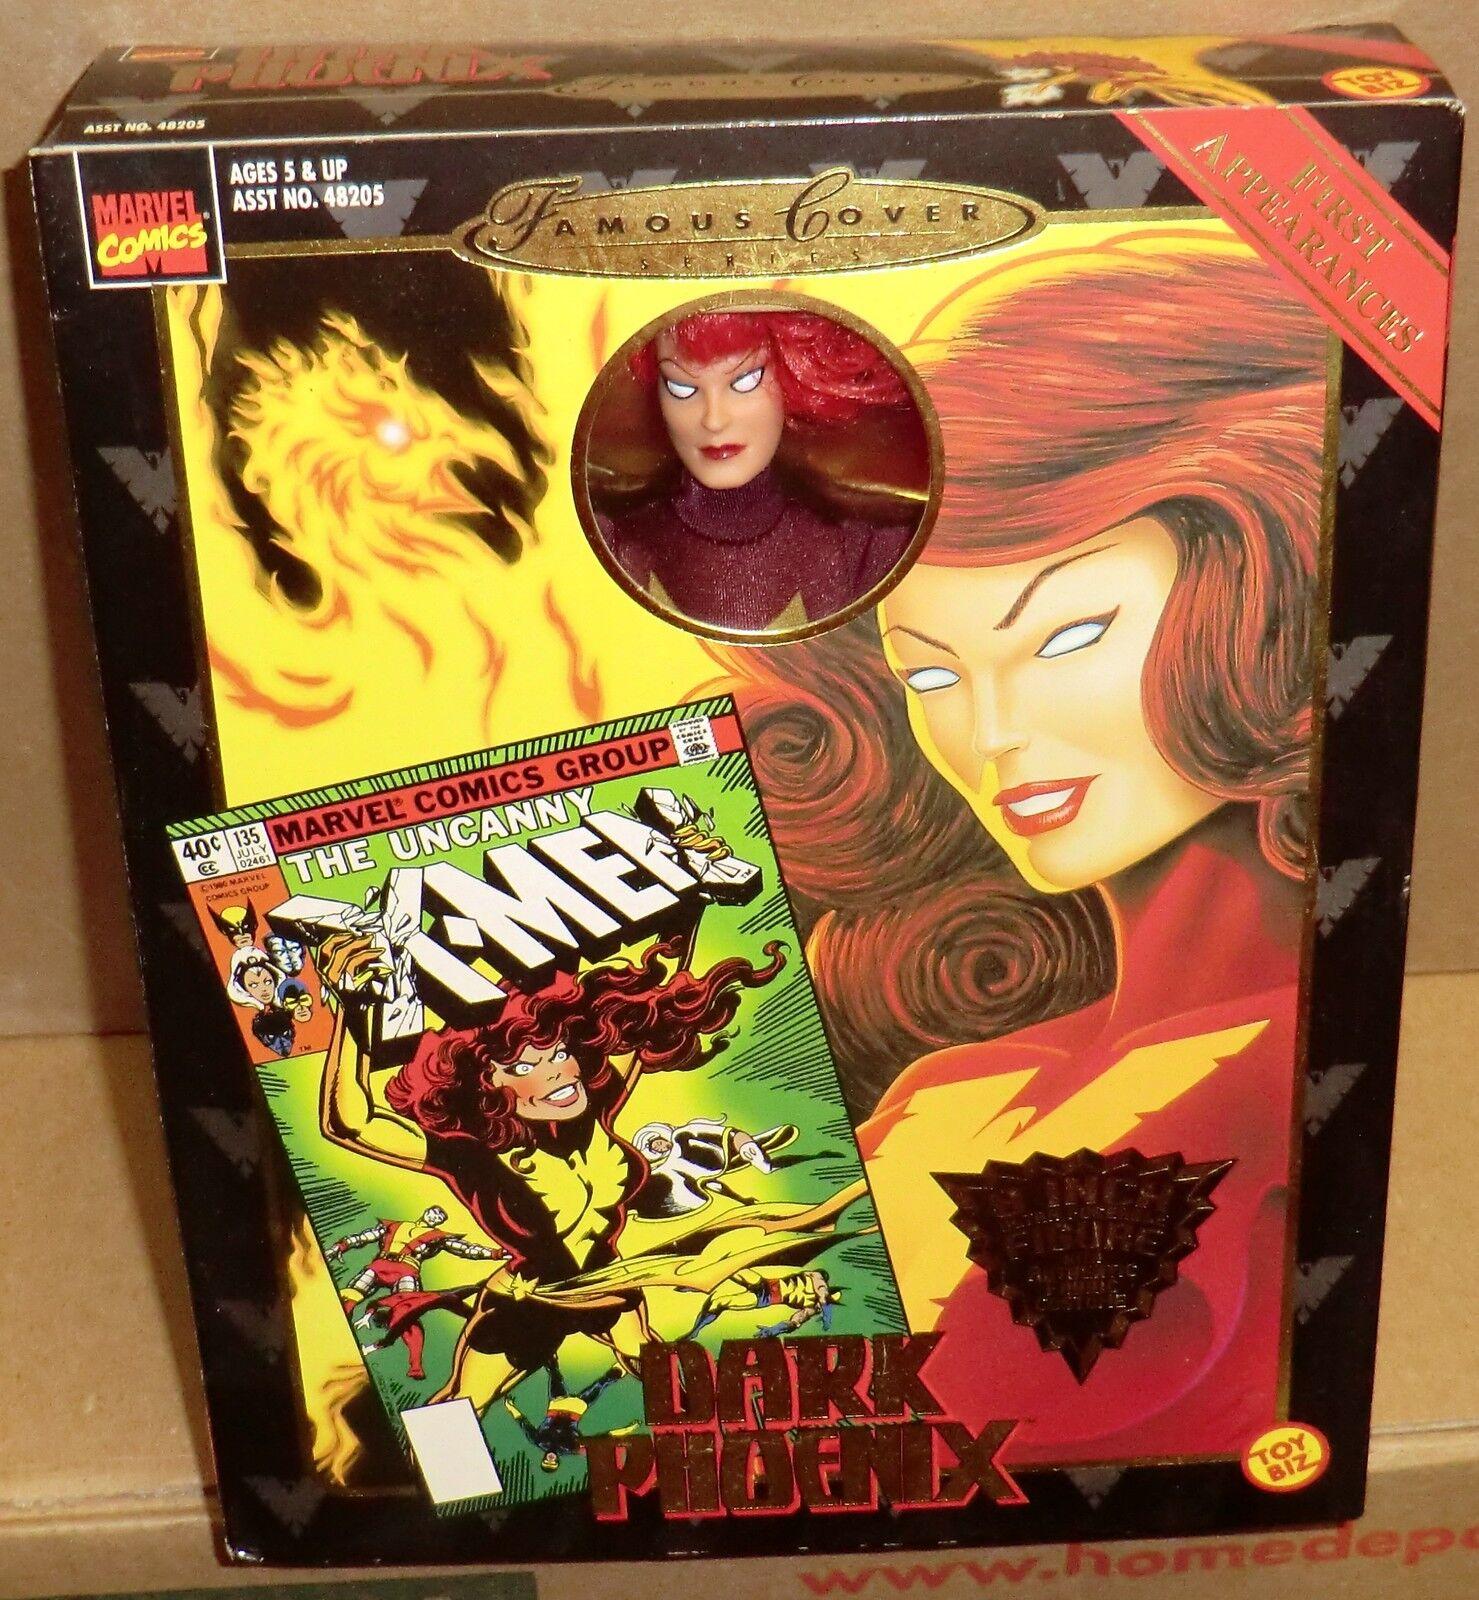 Marvel berhmten umfasst - dunkle phoenix mib